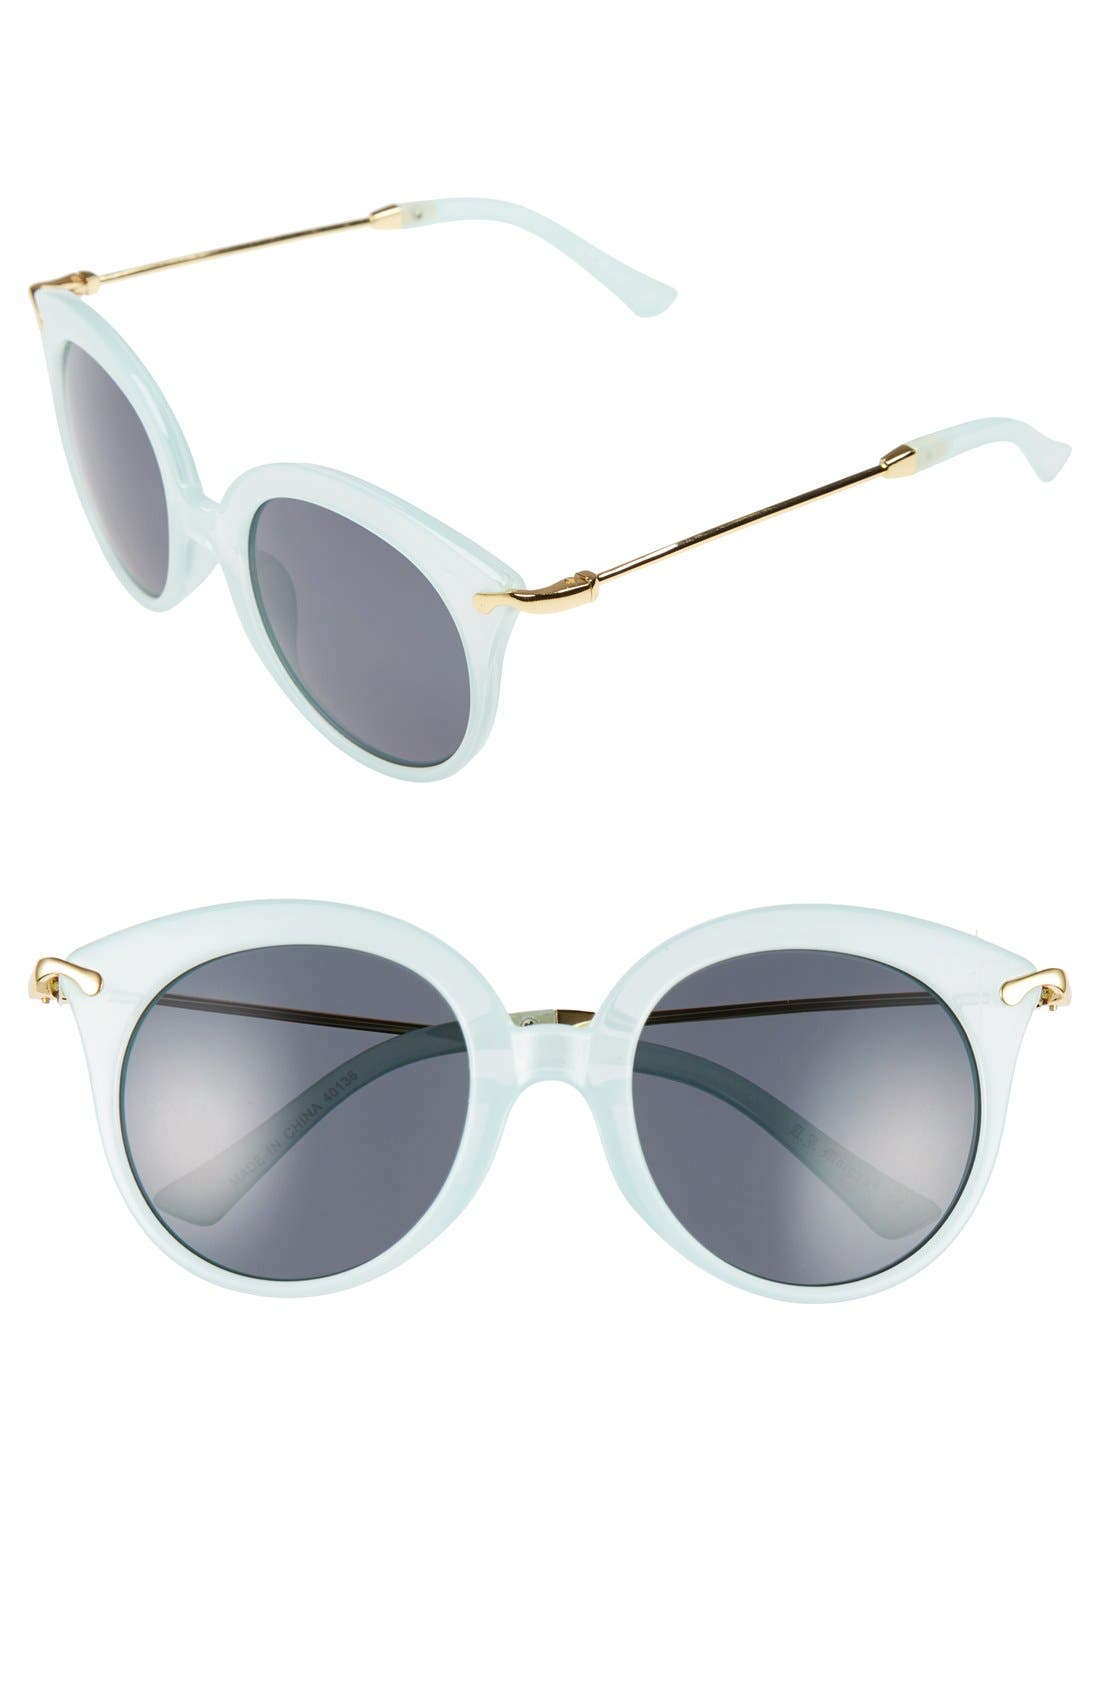 Alternate Image 1 Selected - A.J. Morgan 'Oh Baby' 50mm Cat Eye Sunglasses